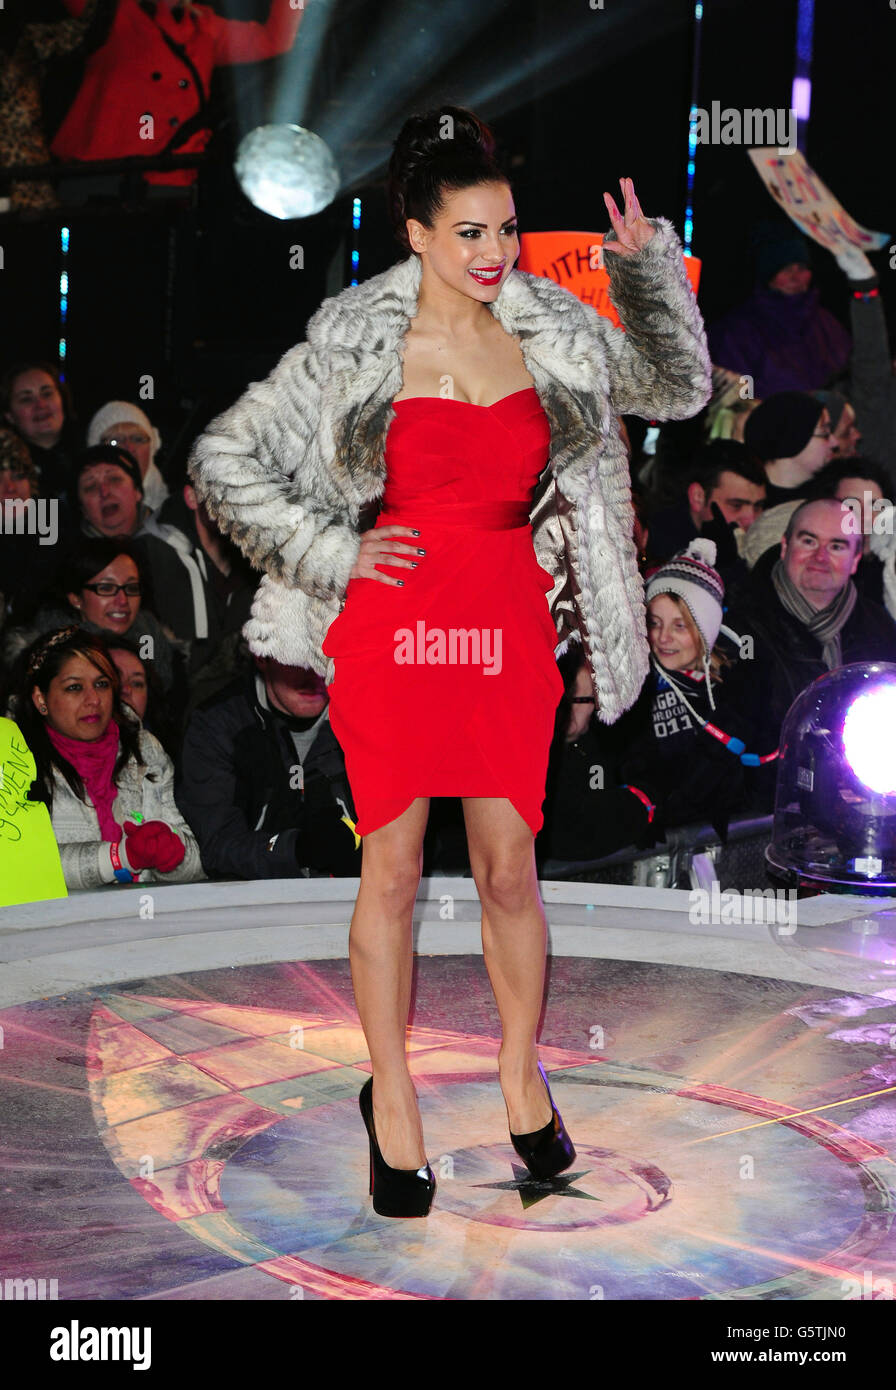 Celebrites Lacey Banghard nude (55 photo), Cleavage